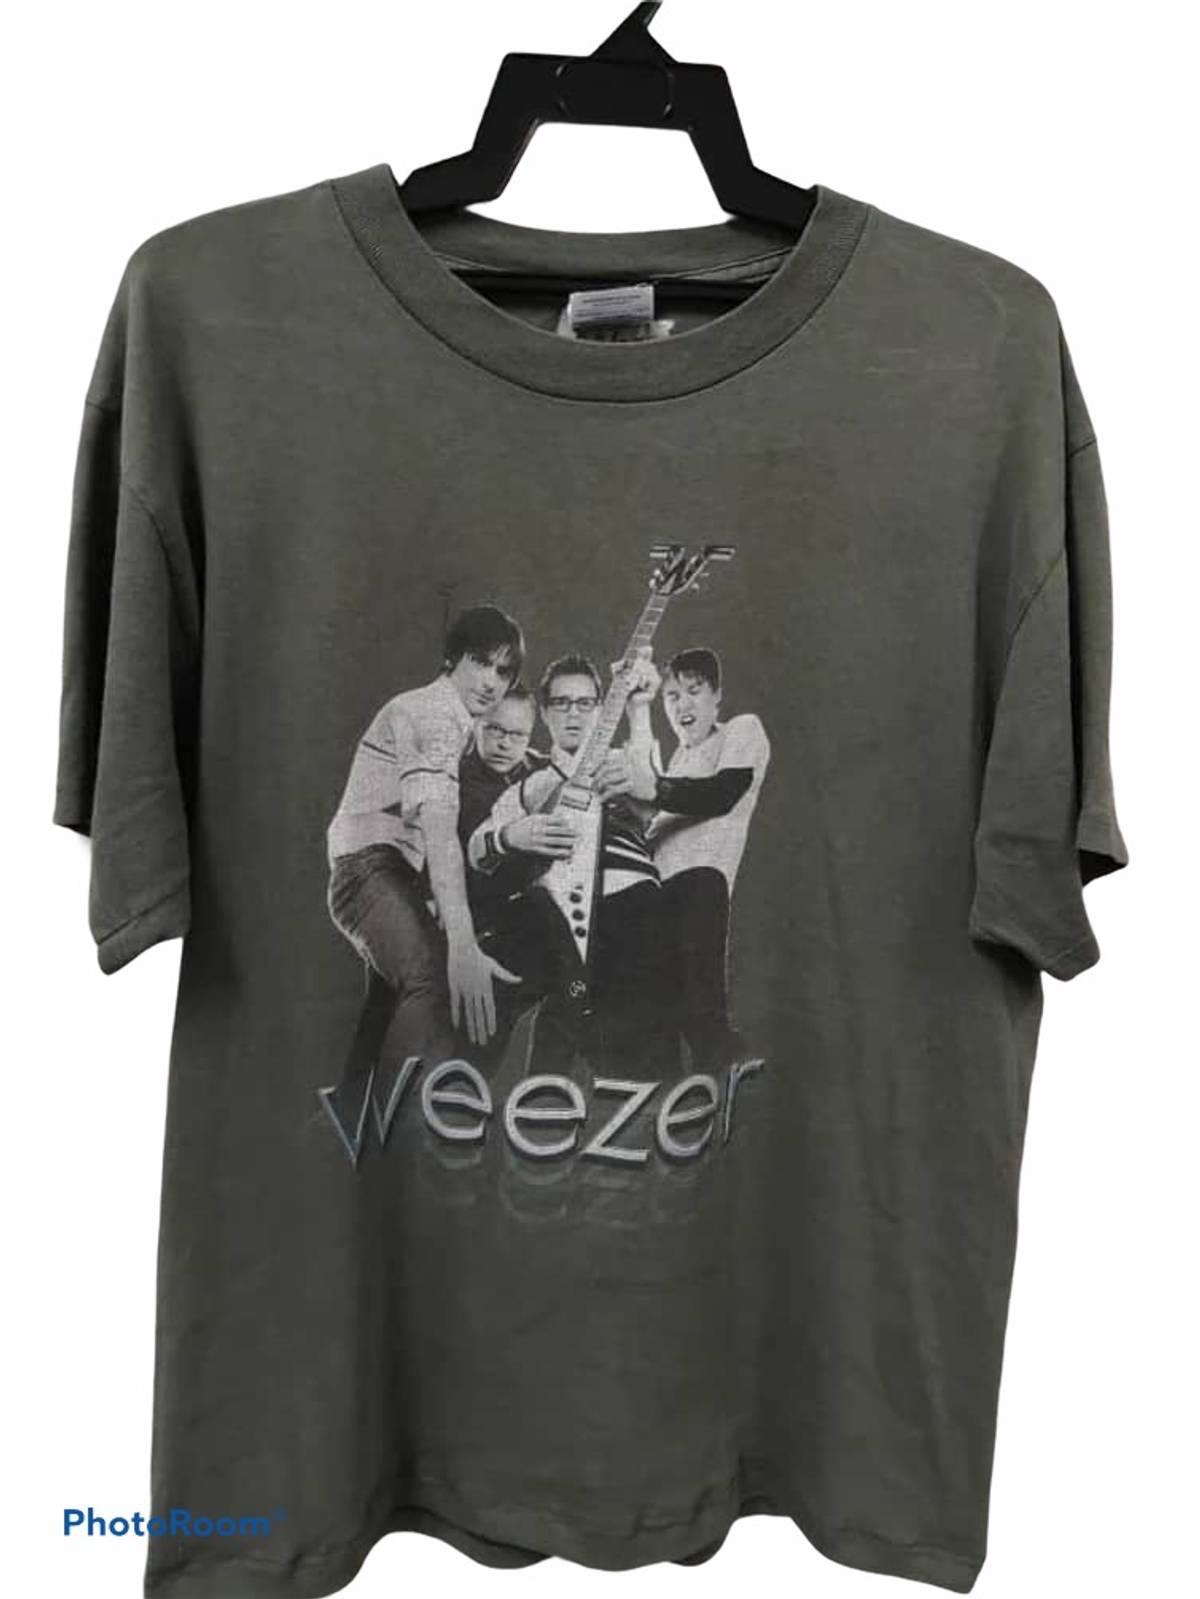 Vintage \u00d7 Band Tees \u00d7 Rock Tees Vintage Weezer Promo Band Shirts